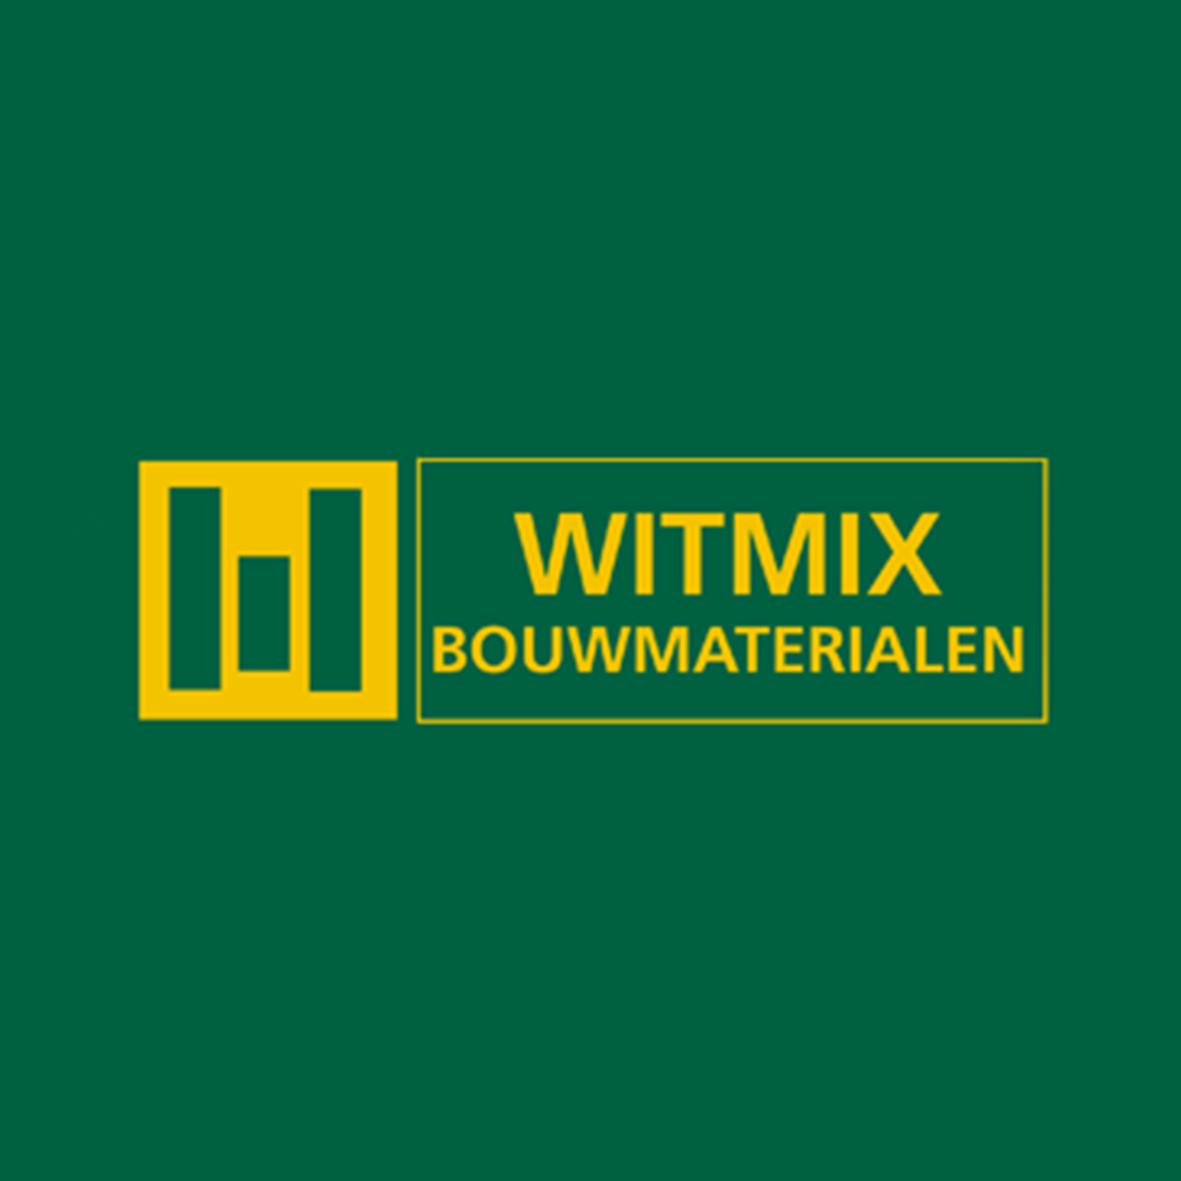 Witmix_Bouwmaterialen